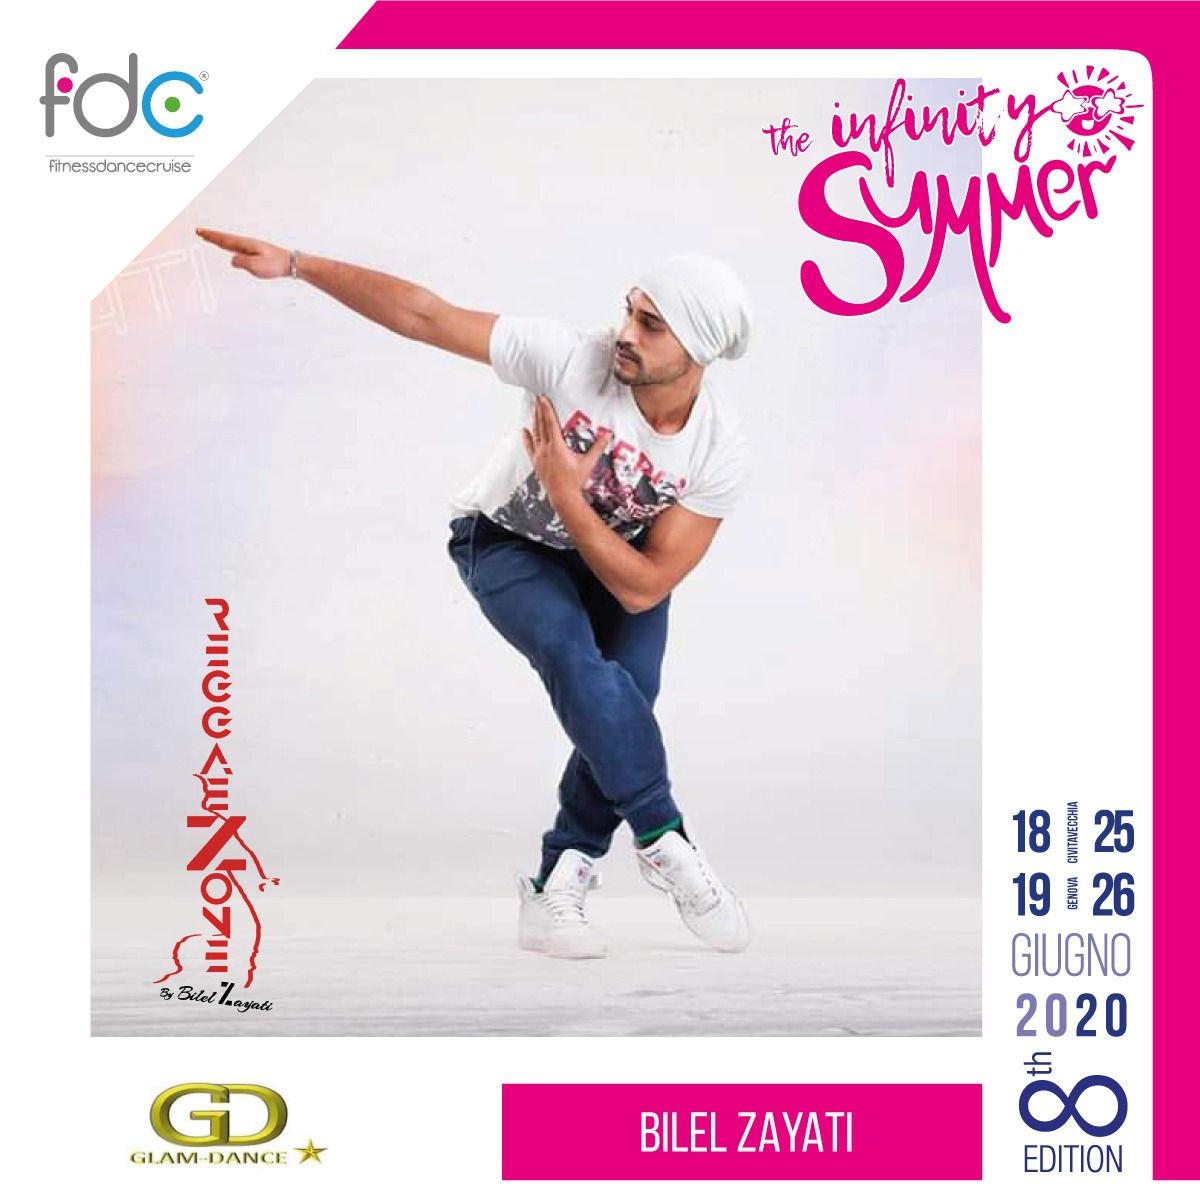 Glam Dance FDC Presenter Bilel Zayati